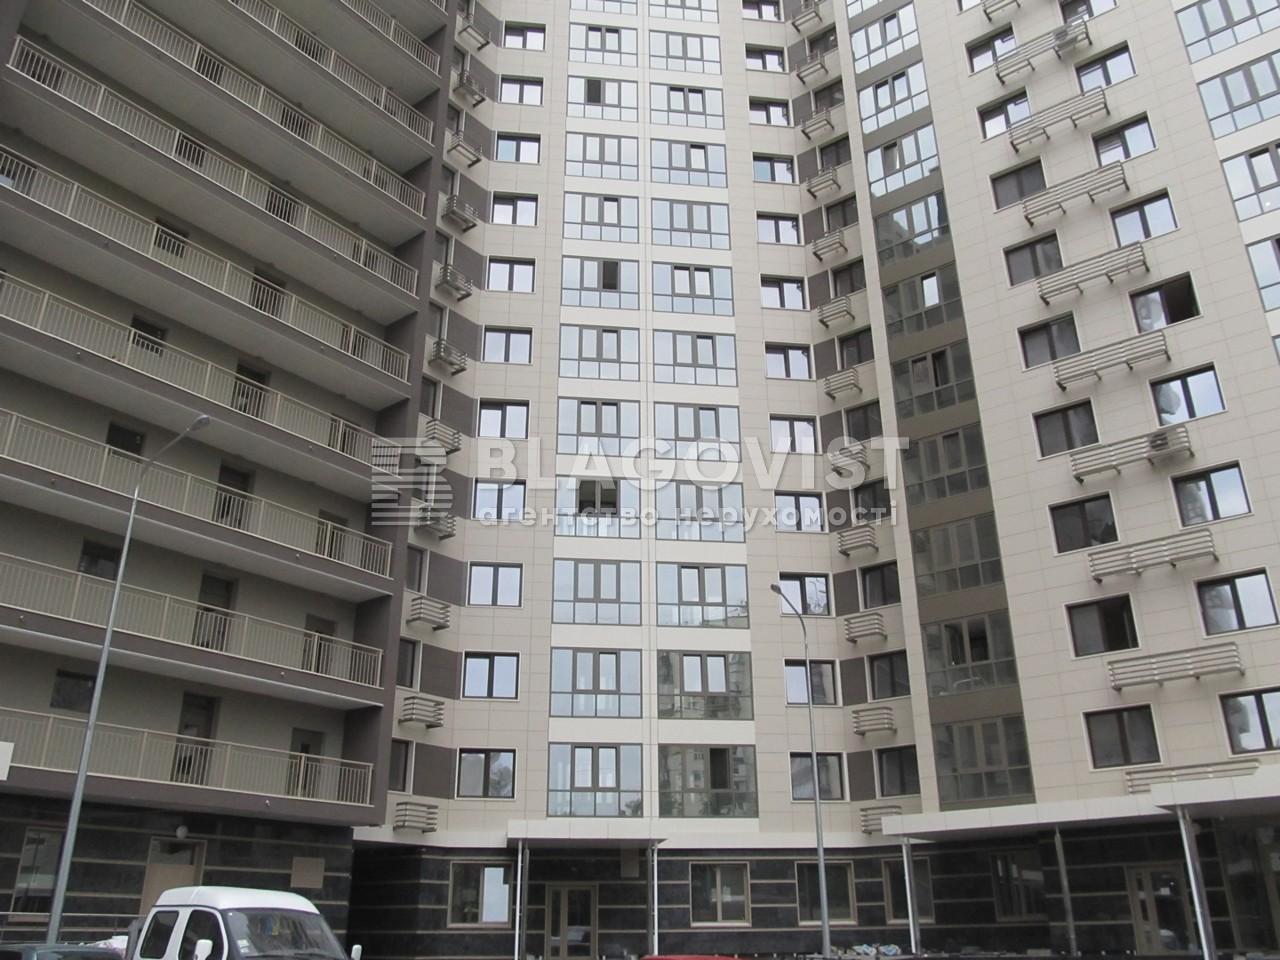 Квартира F-43381, Патріарха Скрипника (Островського Миколи), 40, Київ - Фото 2